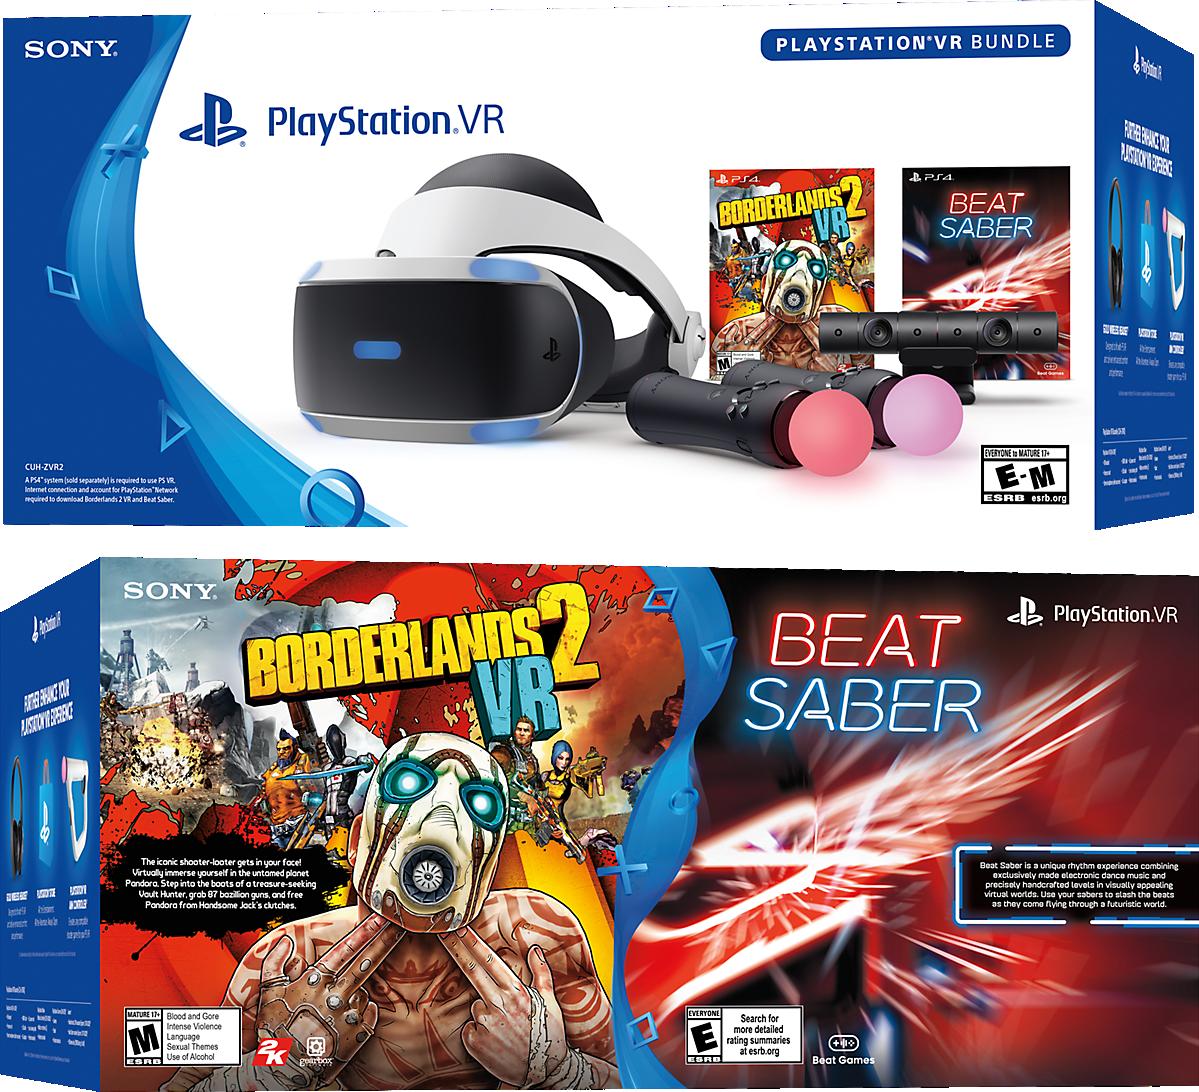 Wario64 On Twitter Playstation Vr Borderlands 2 Vr And Beat Saber Bundle Is Up For Preorder At Gamestop 349 99 Https T Co Jgrqxokgvh Best Buy Https T Co Aq0ffl8y3l Https T Co Tng68vgk3m